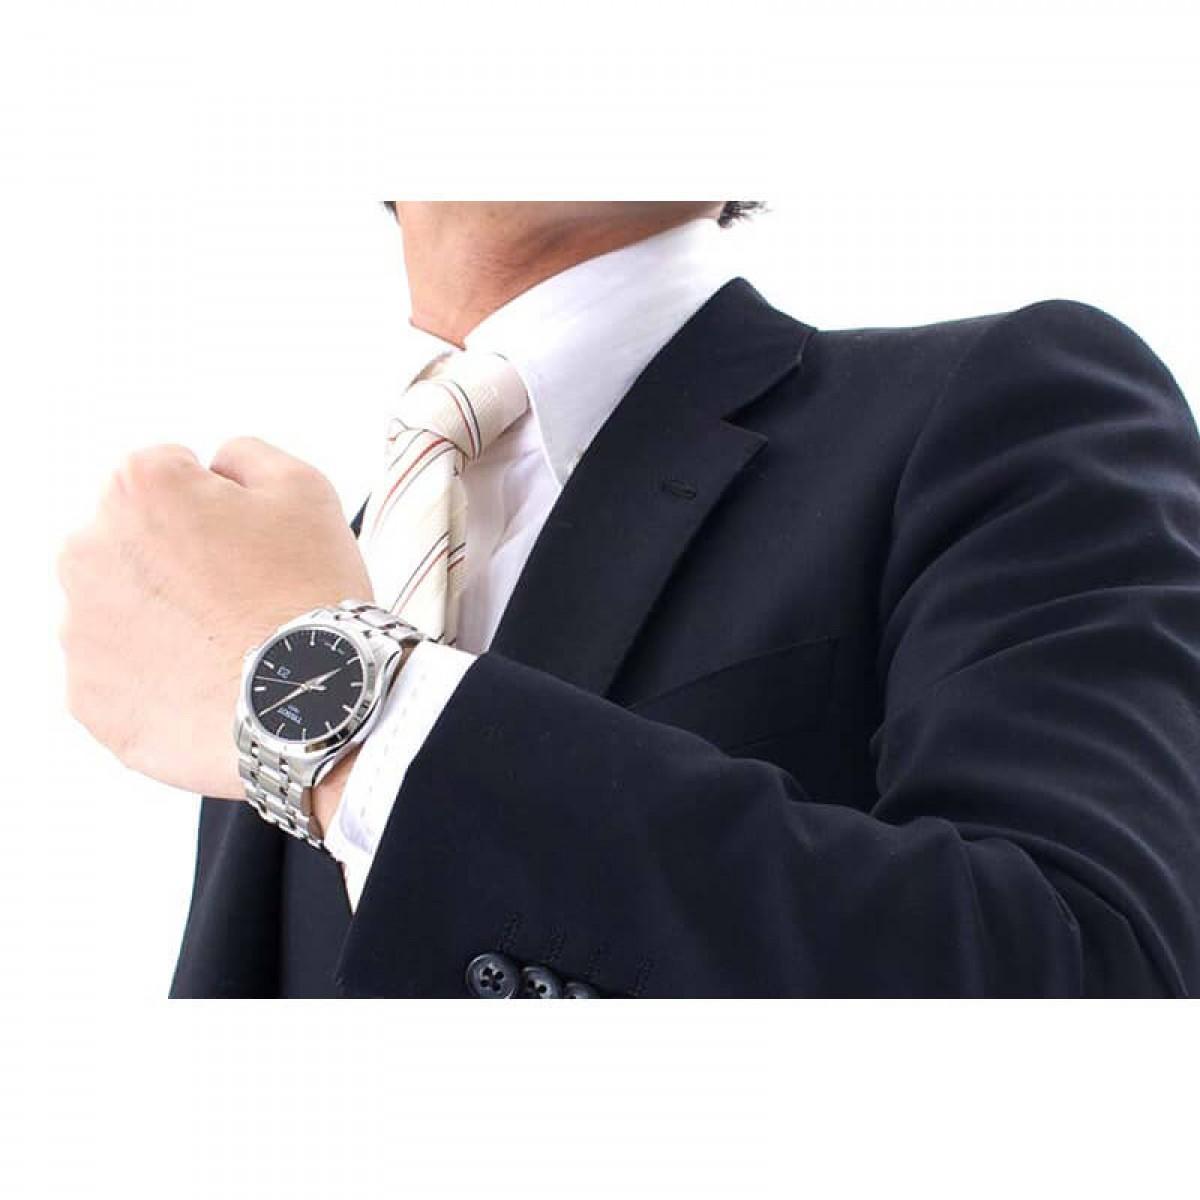 Часовник Tissot T035.410.11.051.00